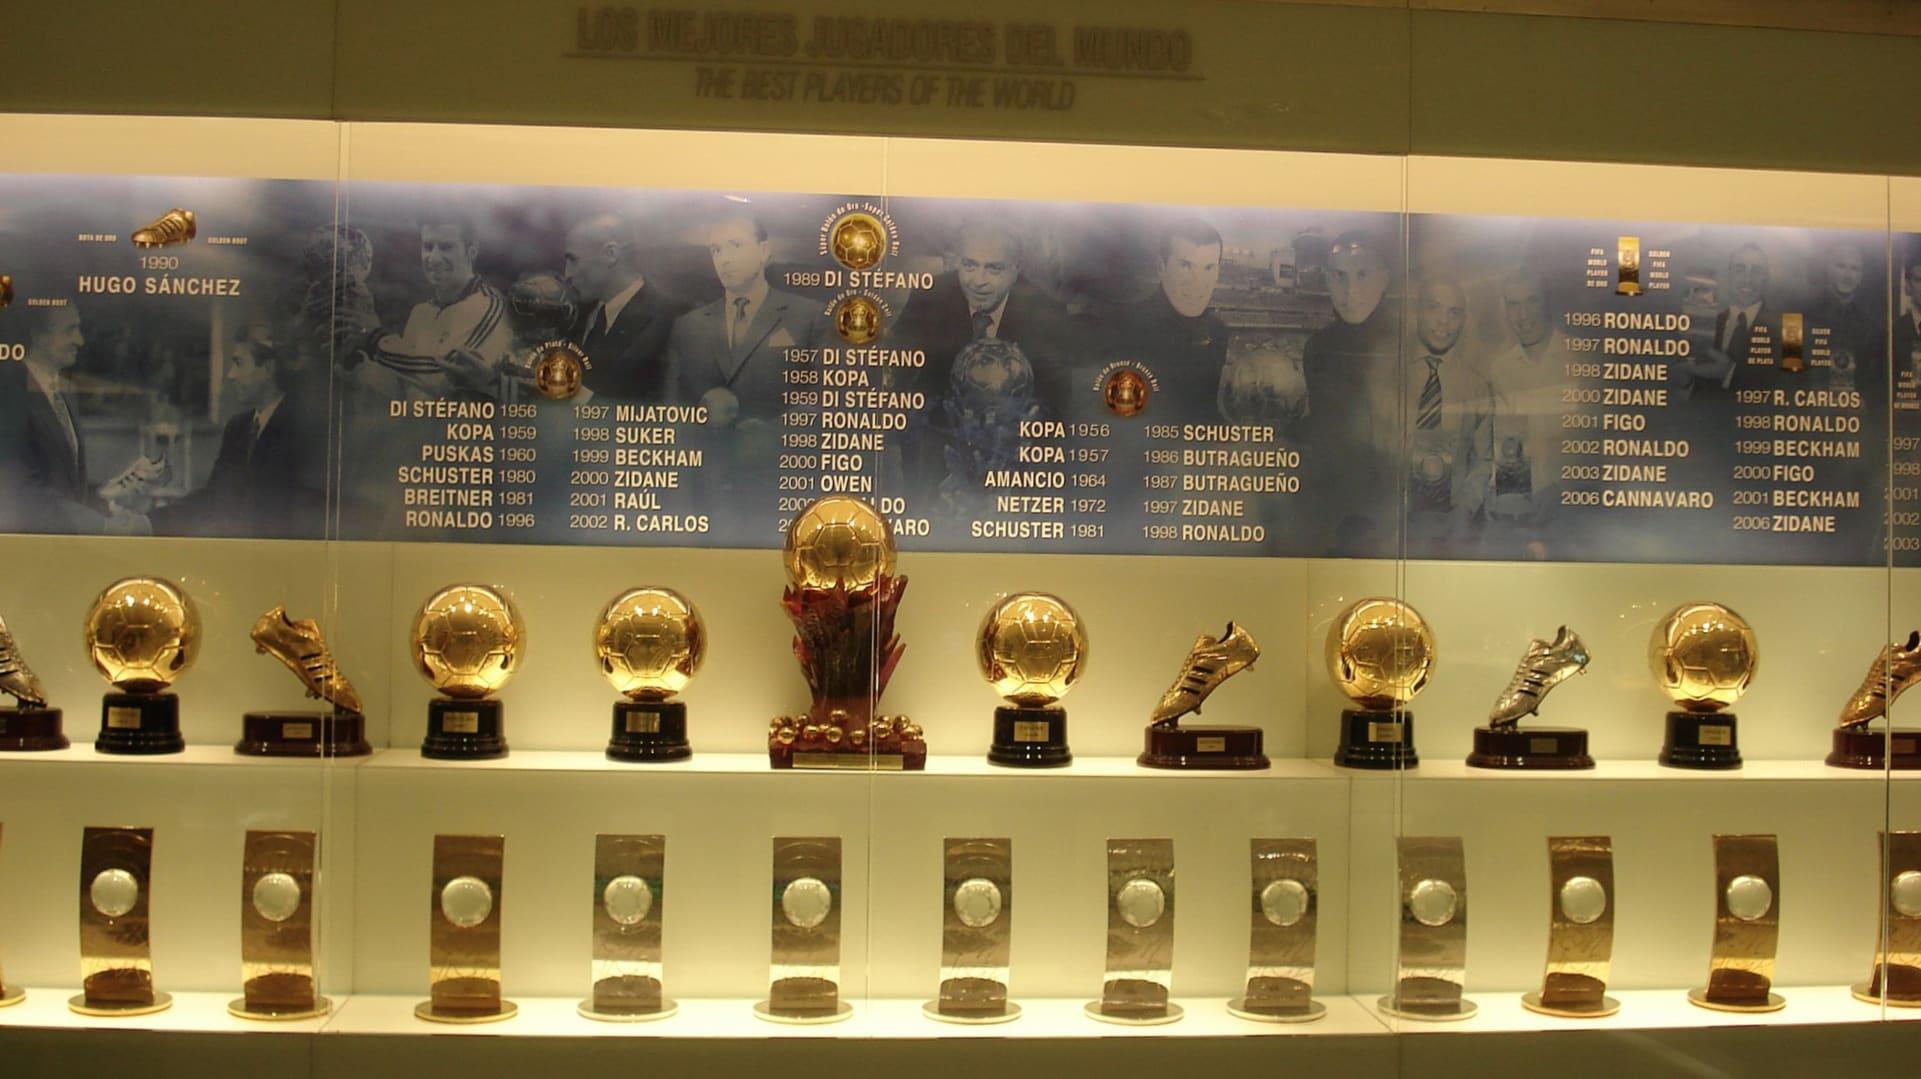 Balónes_de_Oro_at_Real_Madrid_Museum